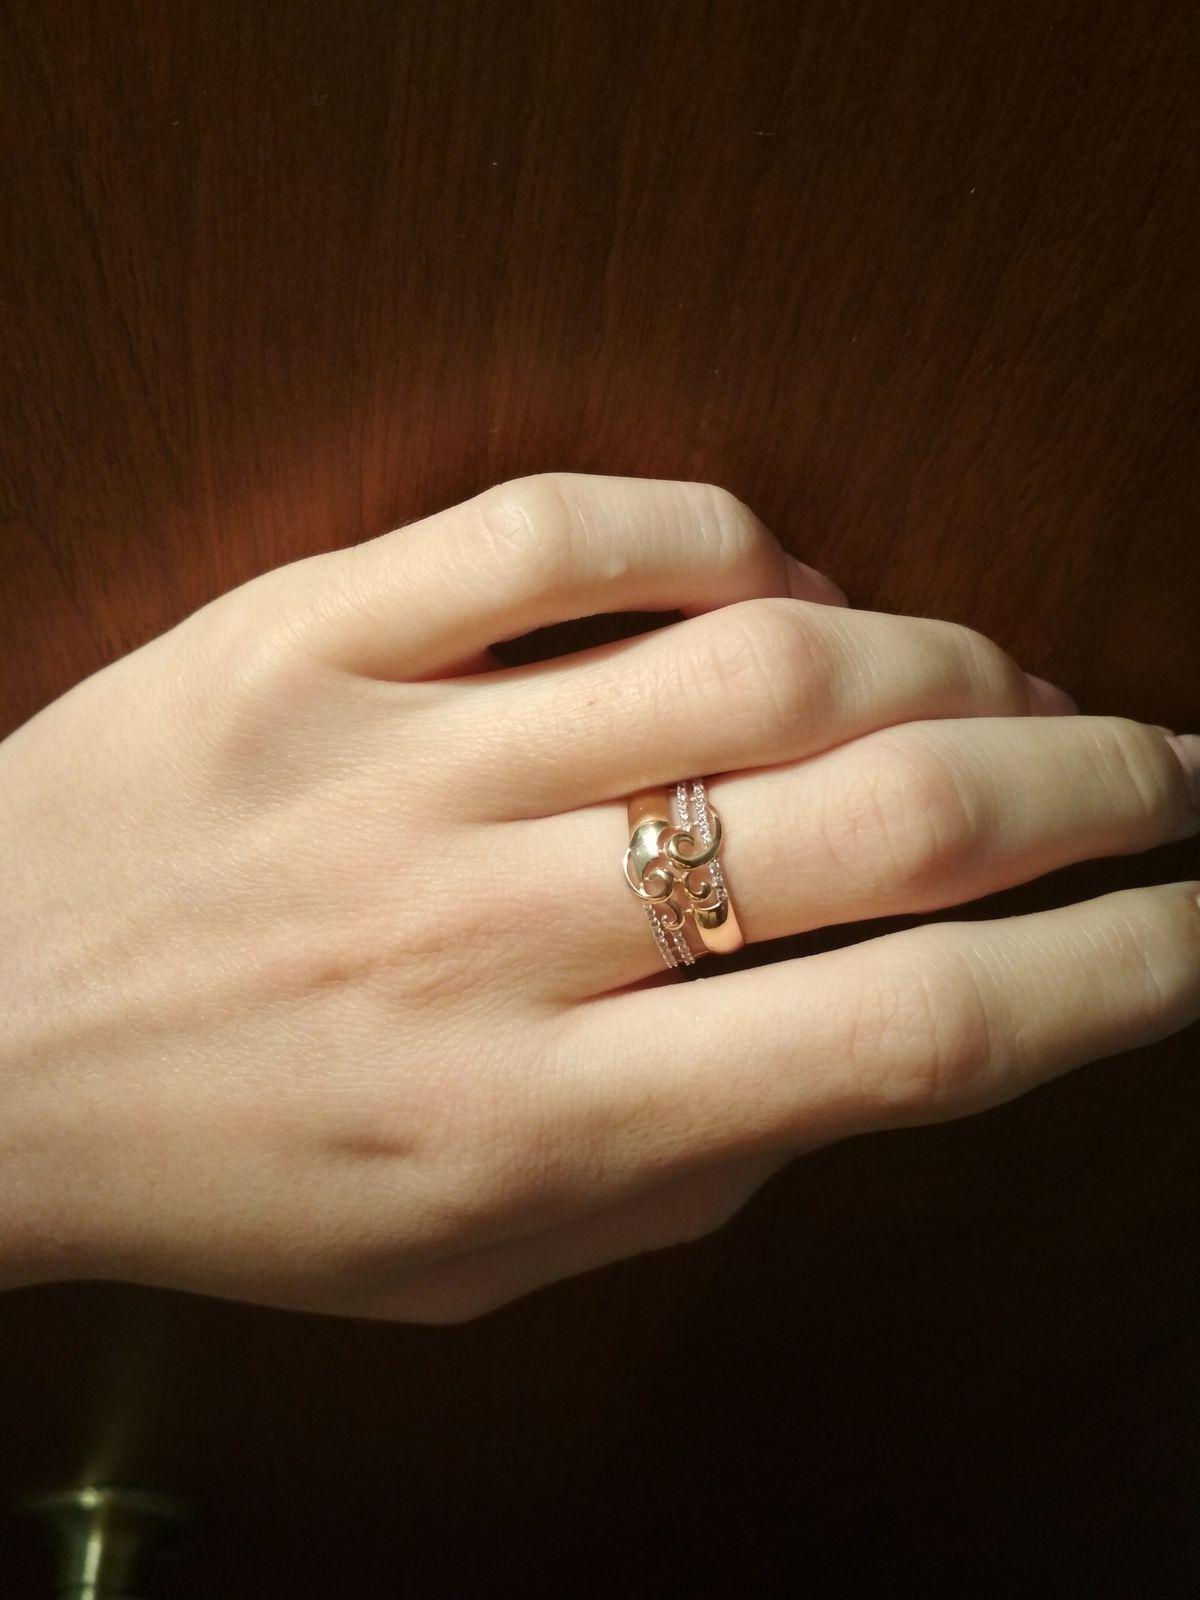 Дико красивое кольцо